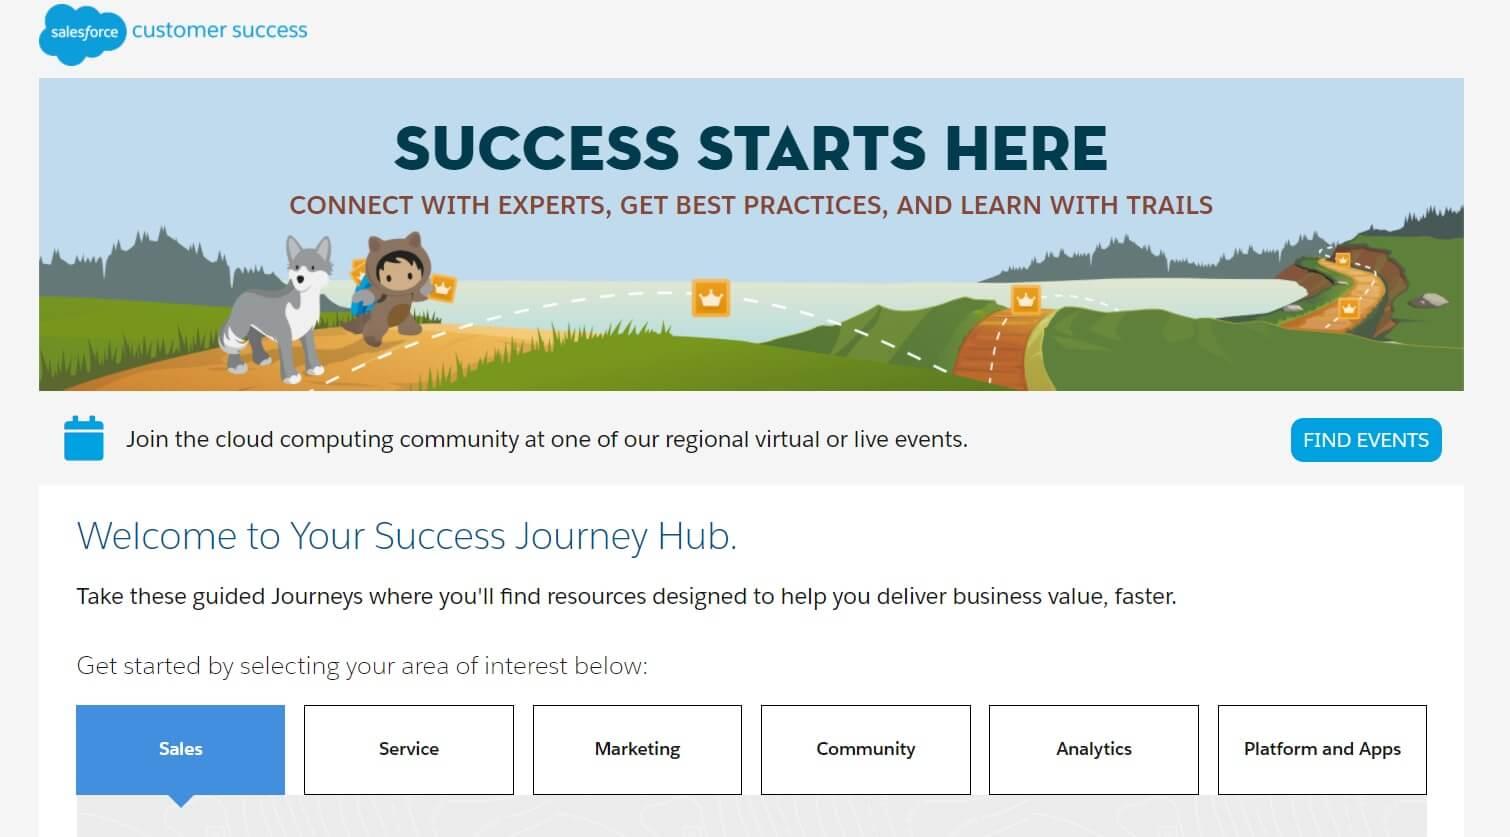 Salesforce-Success-Journey-Hub